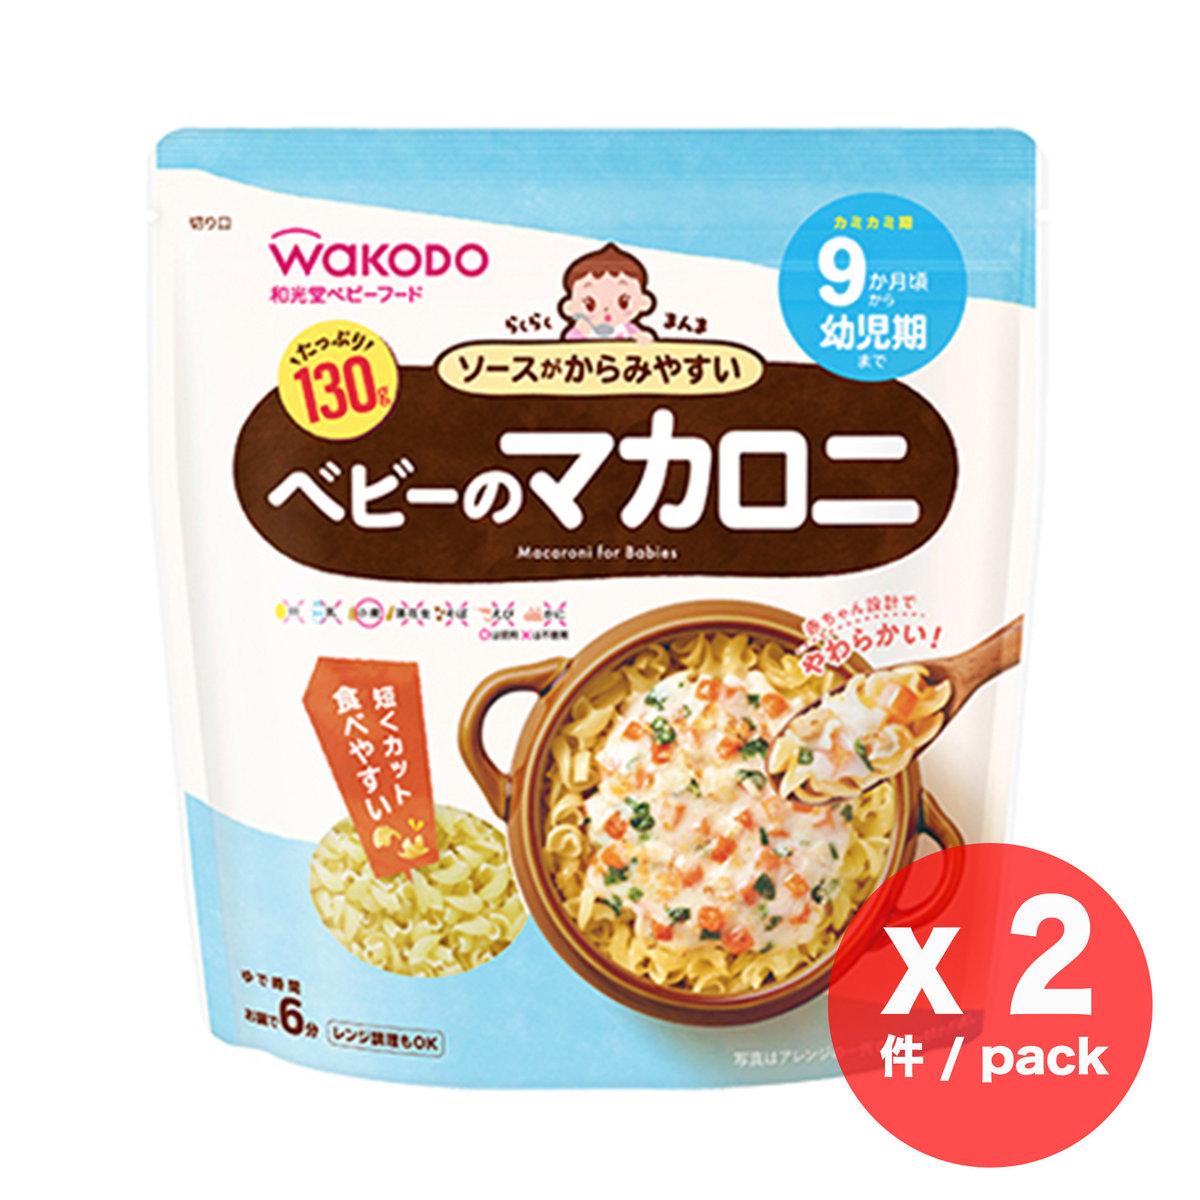 Wakodo Macaroni for Babies (New packing) 130g x 2 pack